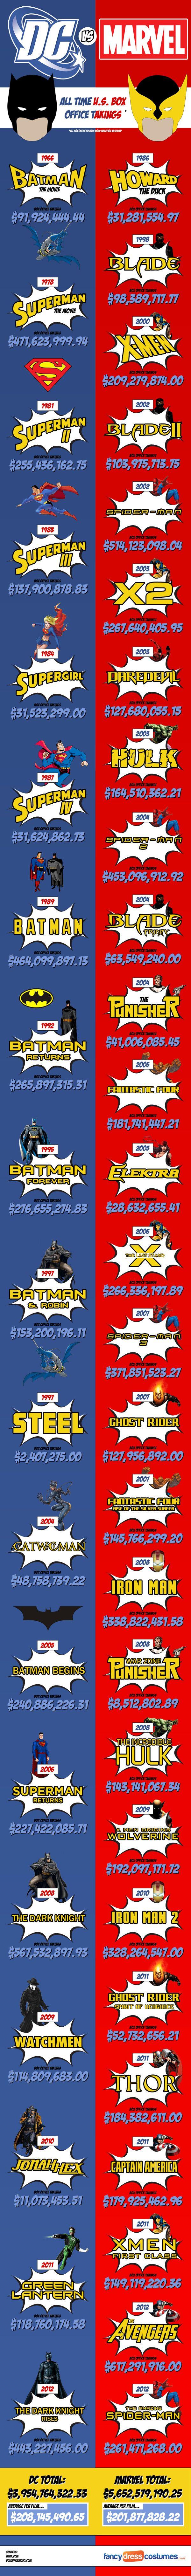 Pendapatan Box Office Antara Marvel vs DC (Infographic)